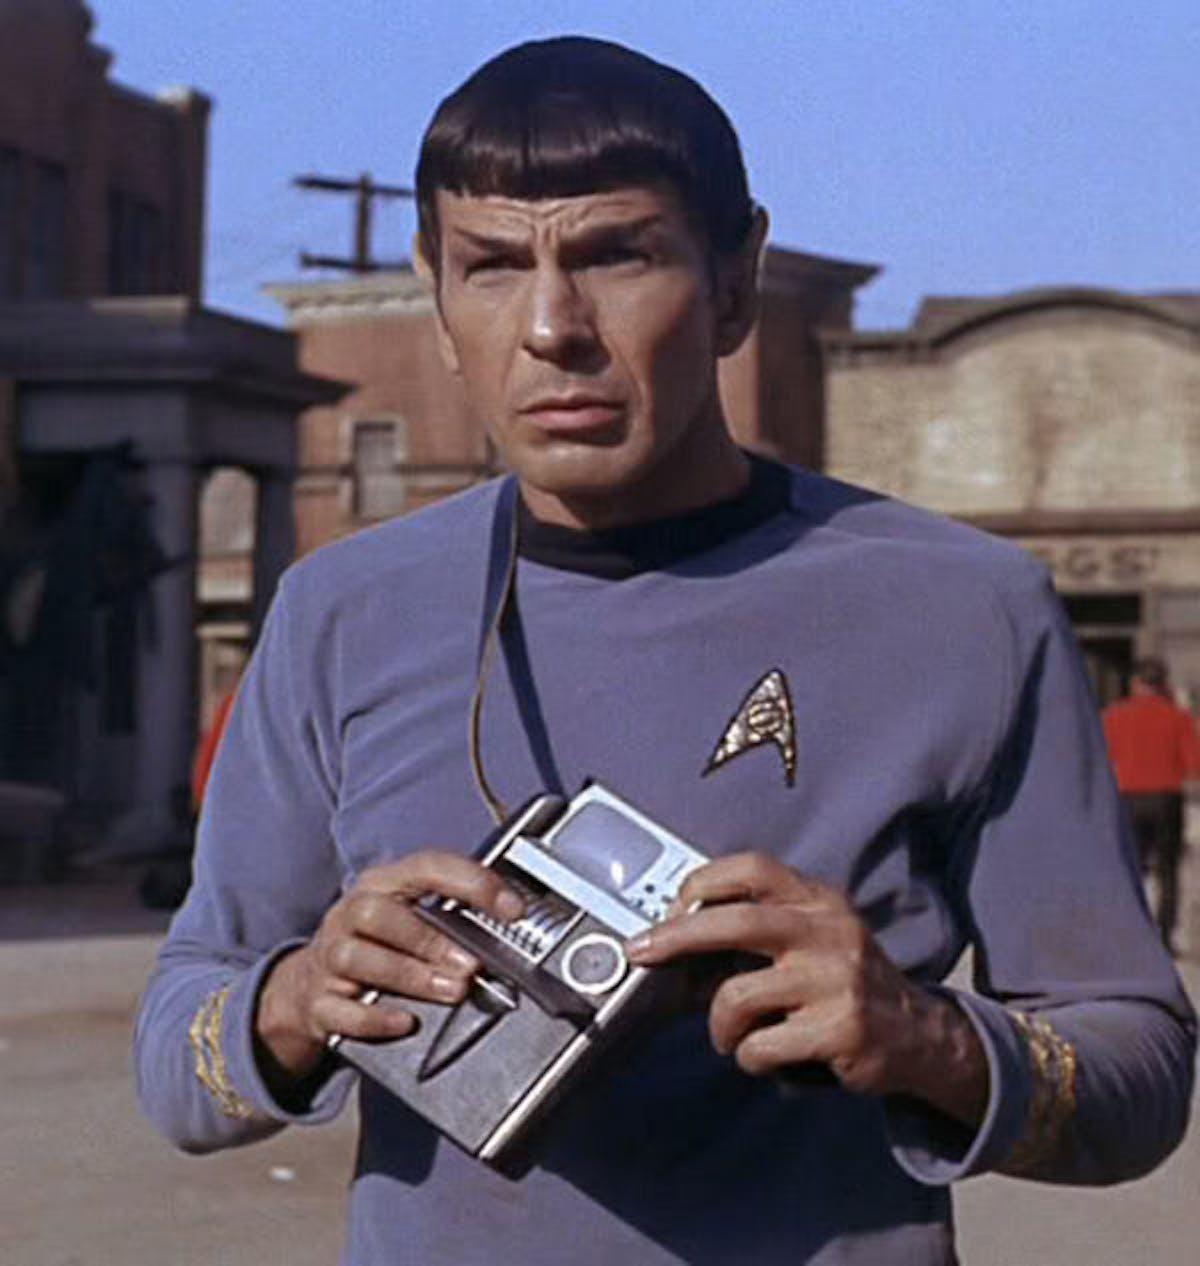 Spock holding a tricorder in the original series Star Trek.